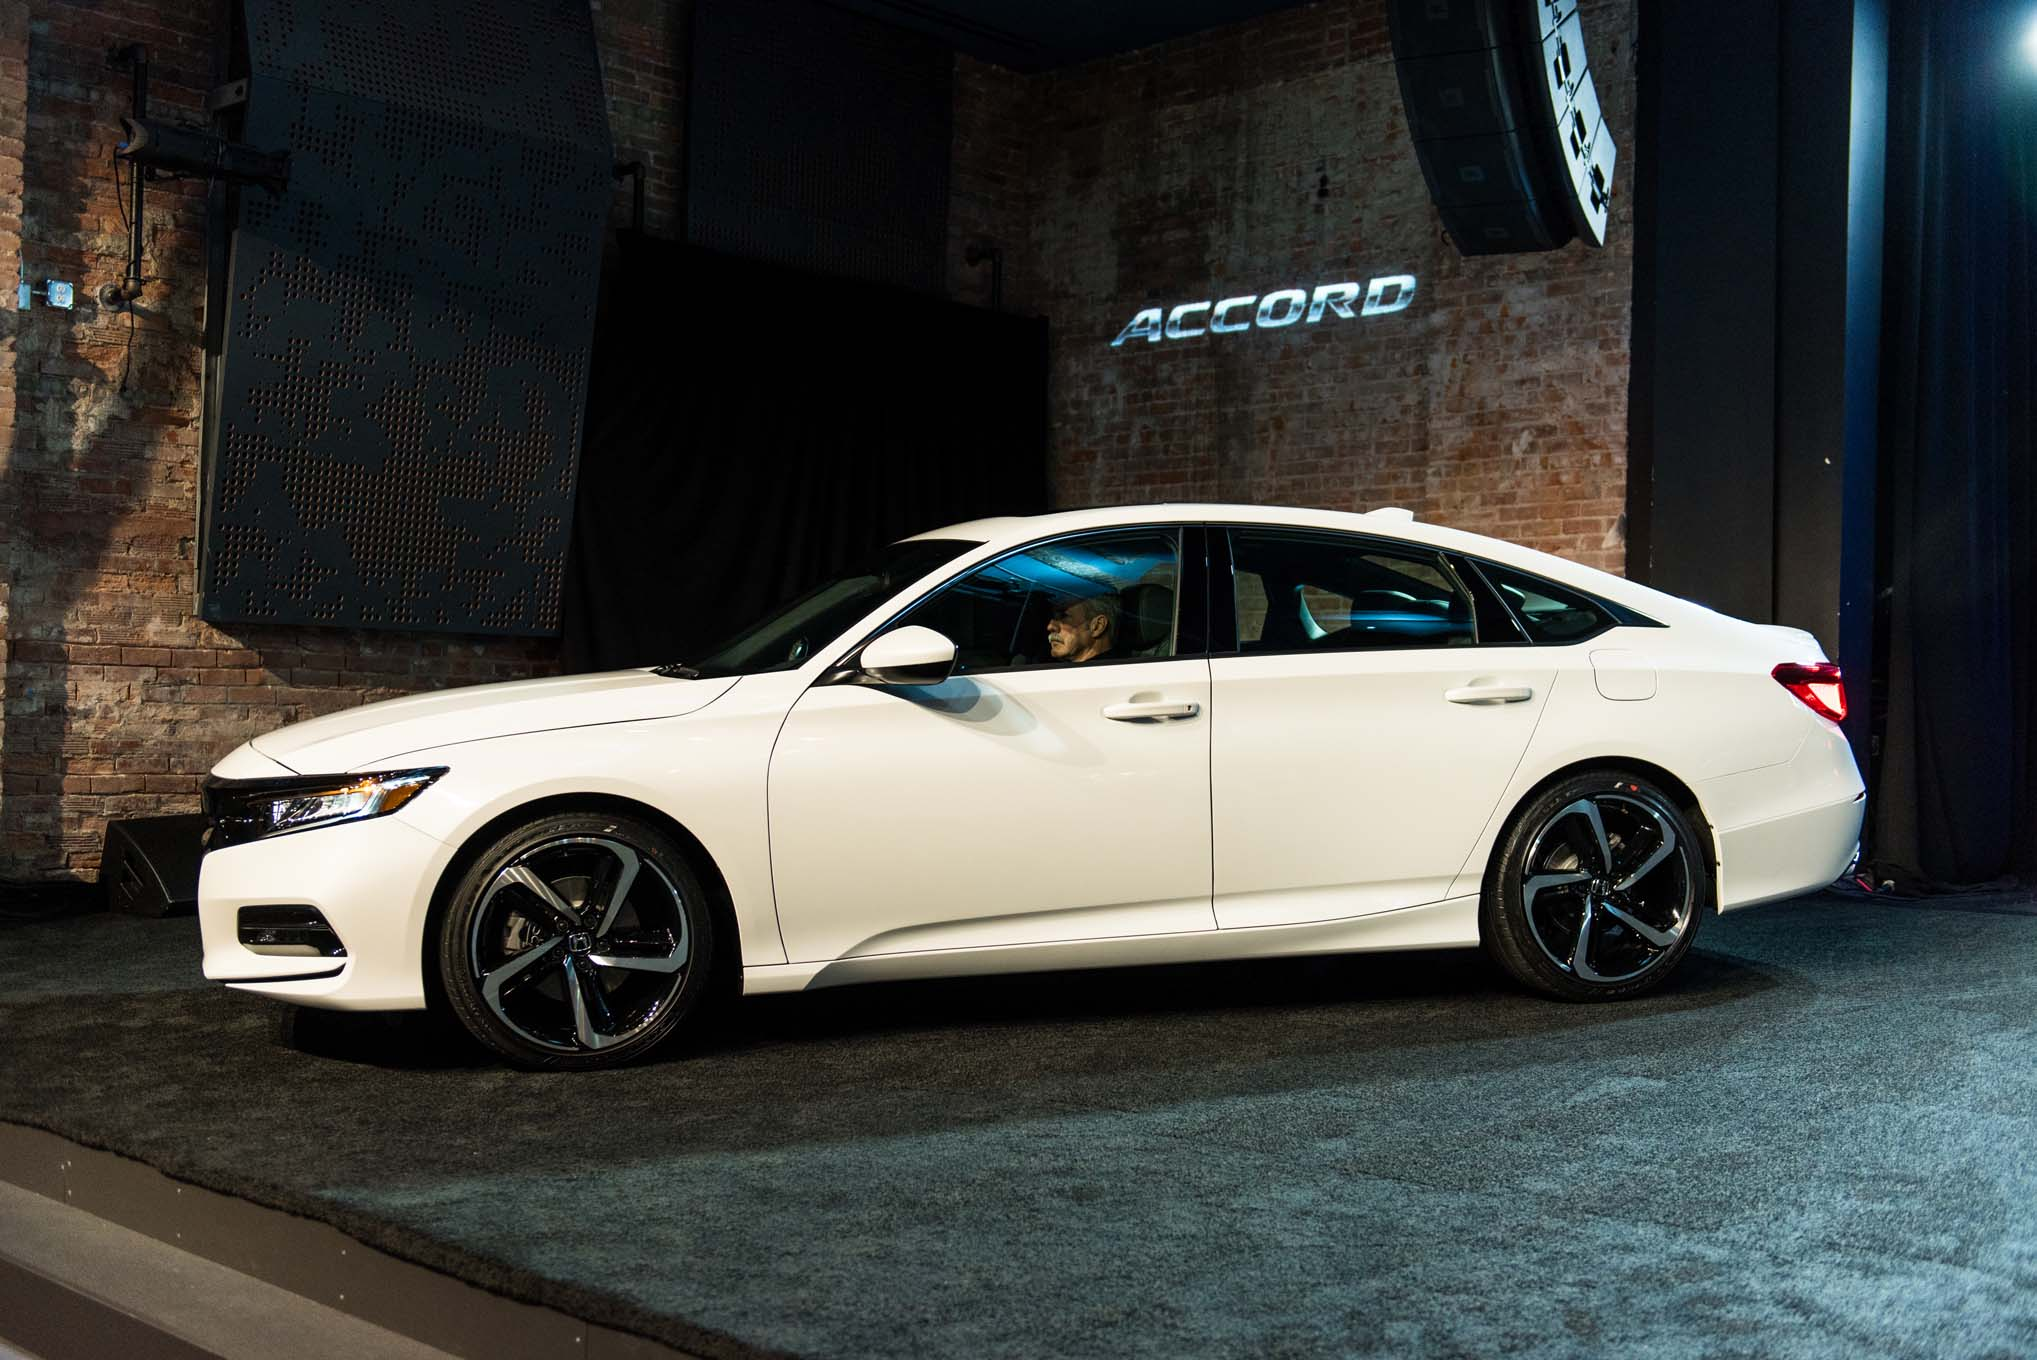 Хонда представила новую модель Accord Sport 2,0T